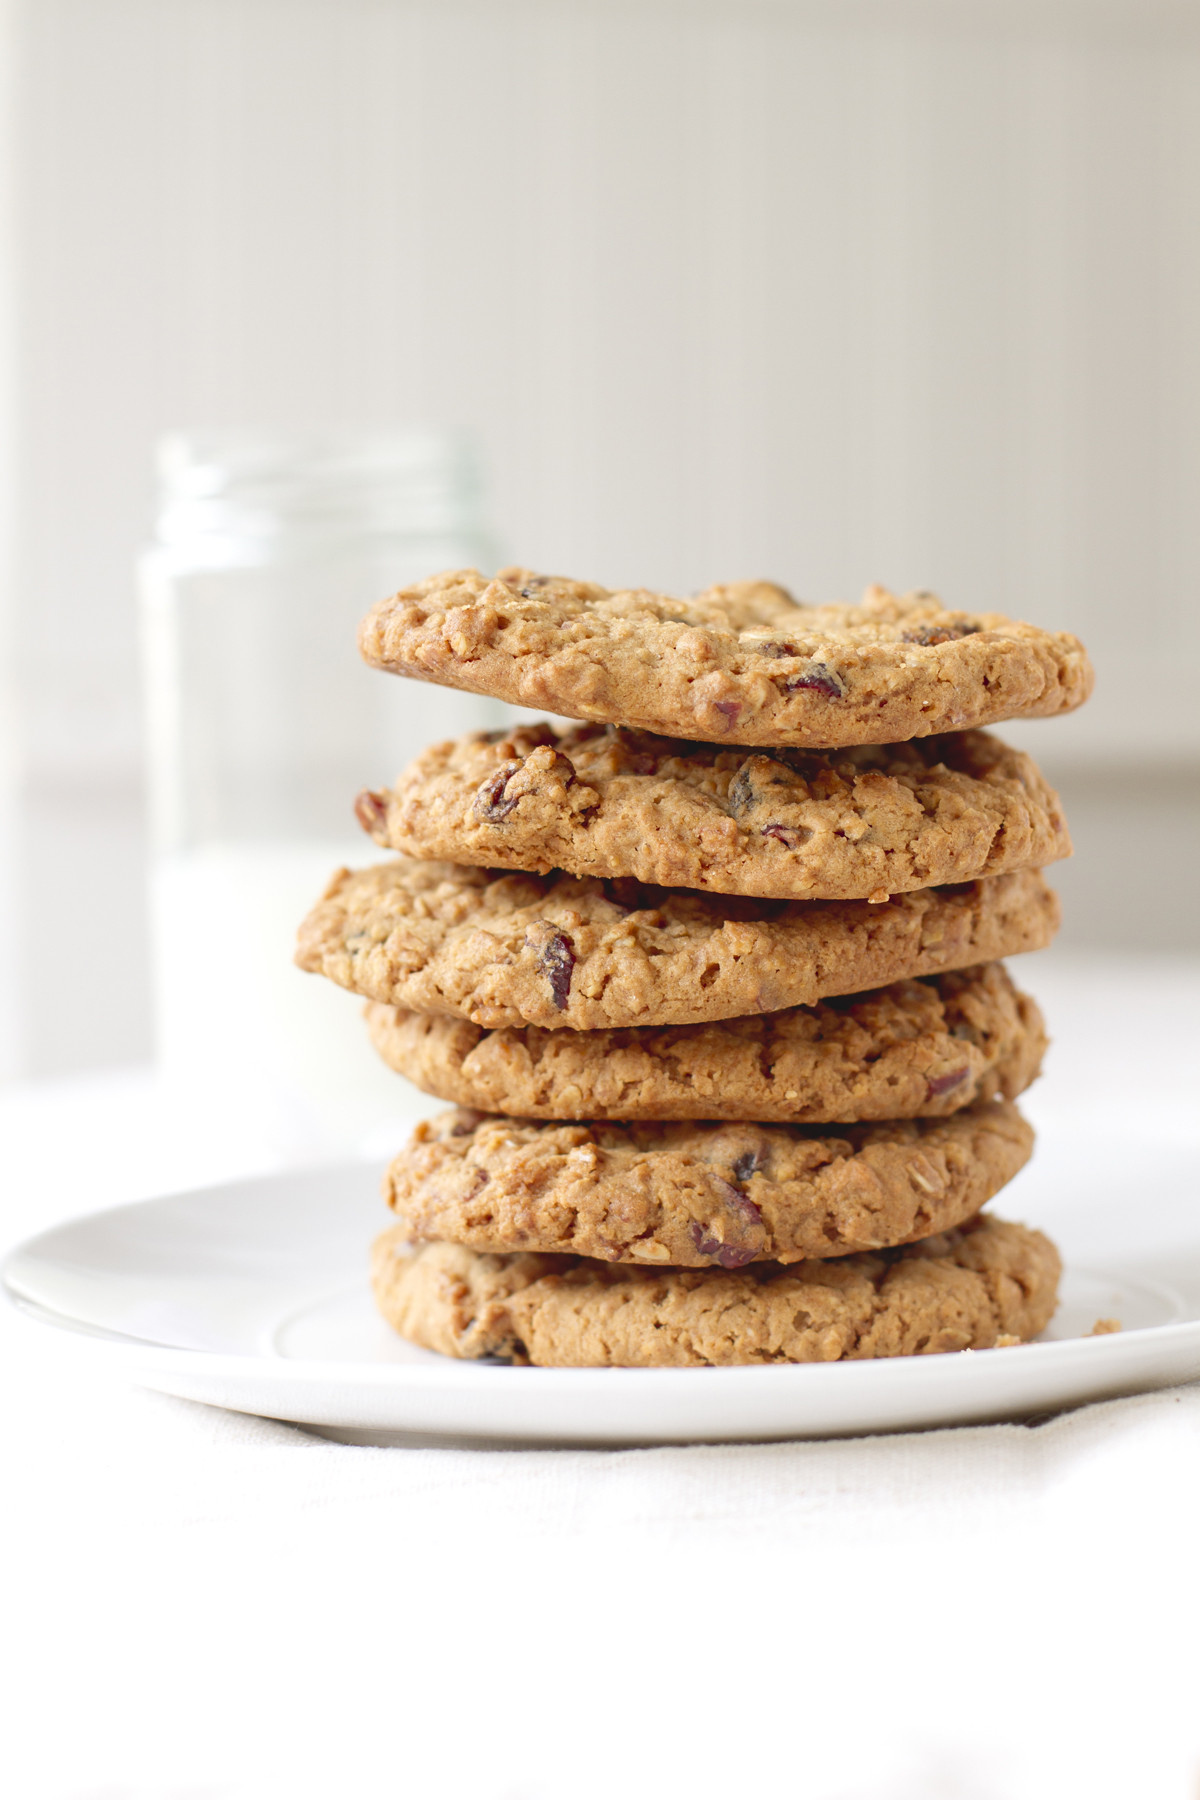 Healthy Oatmeal Raisin Cookies Applesauce  Applesauce Oatmeal Raisin Cookies